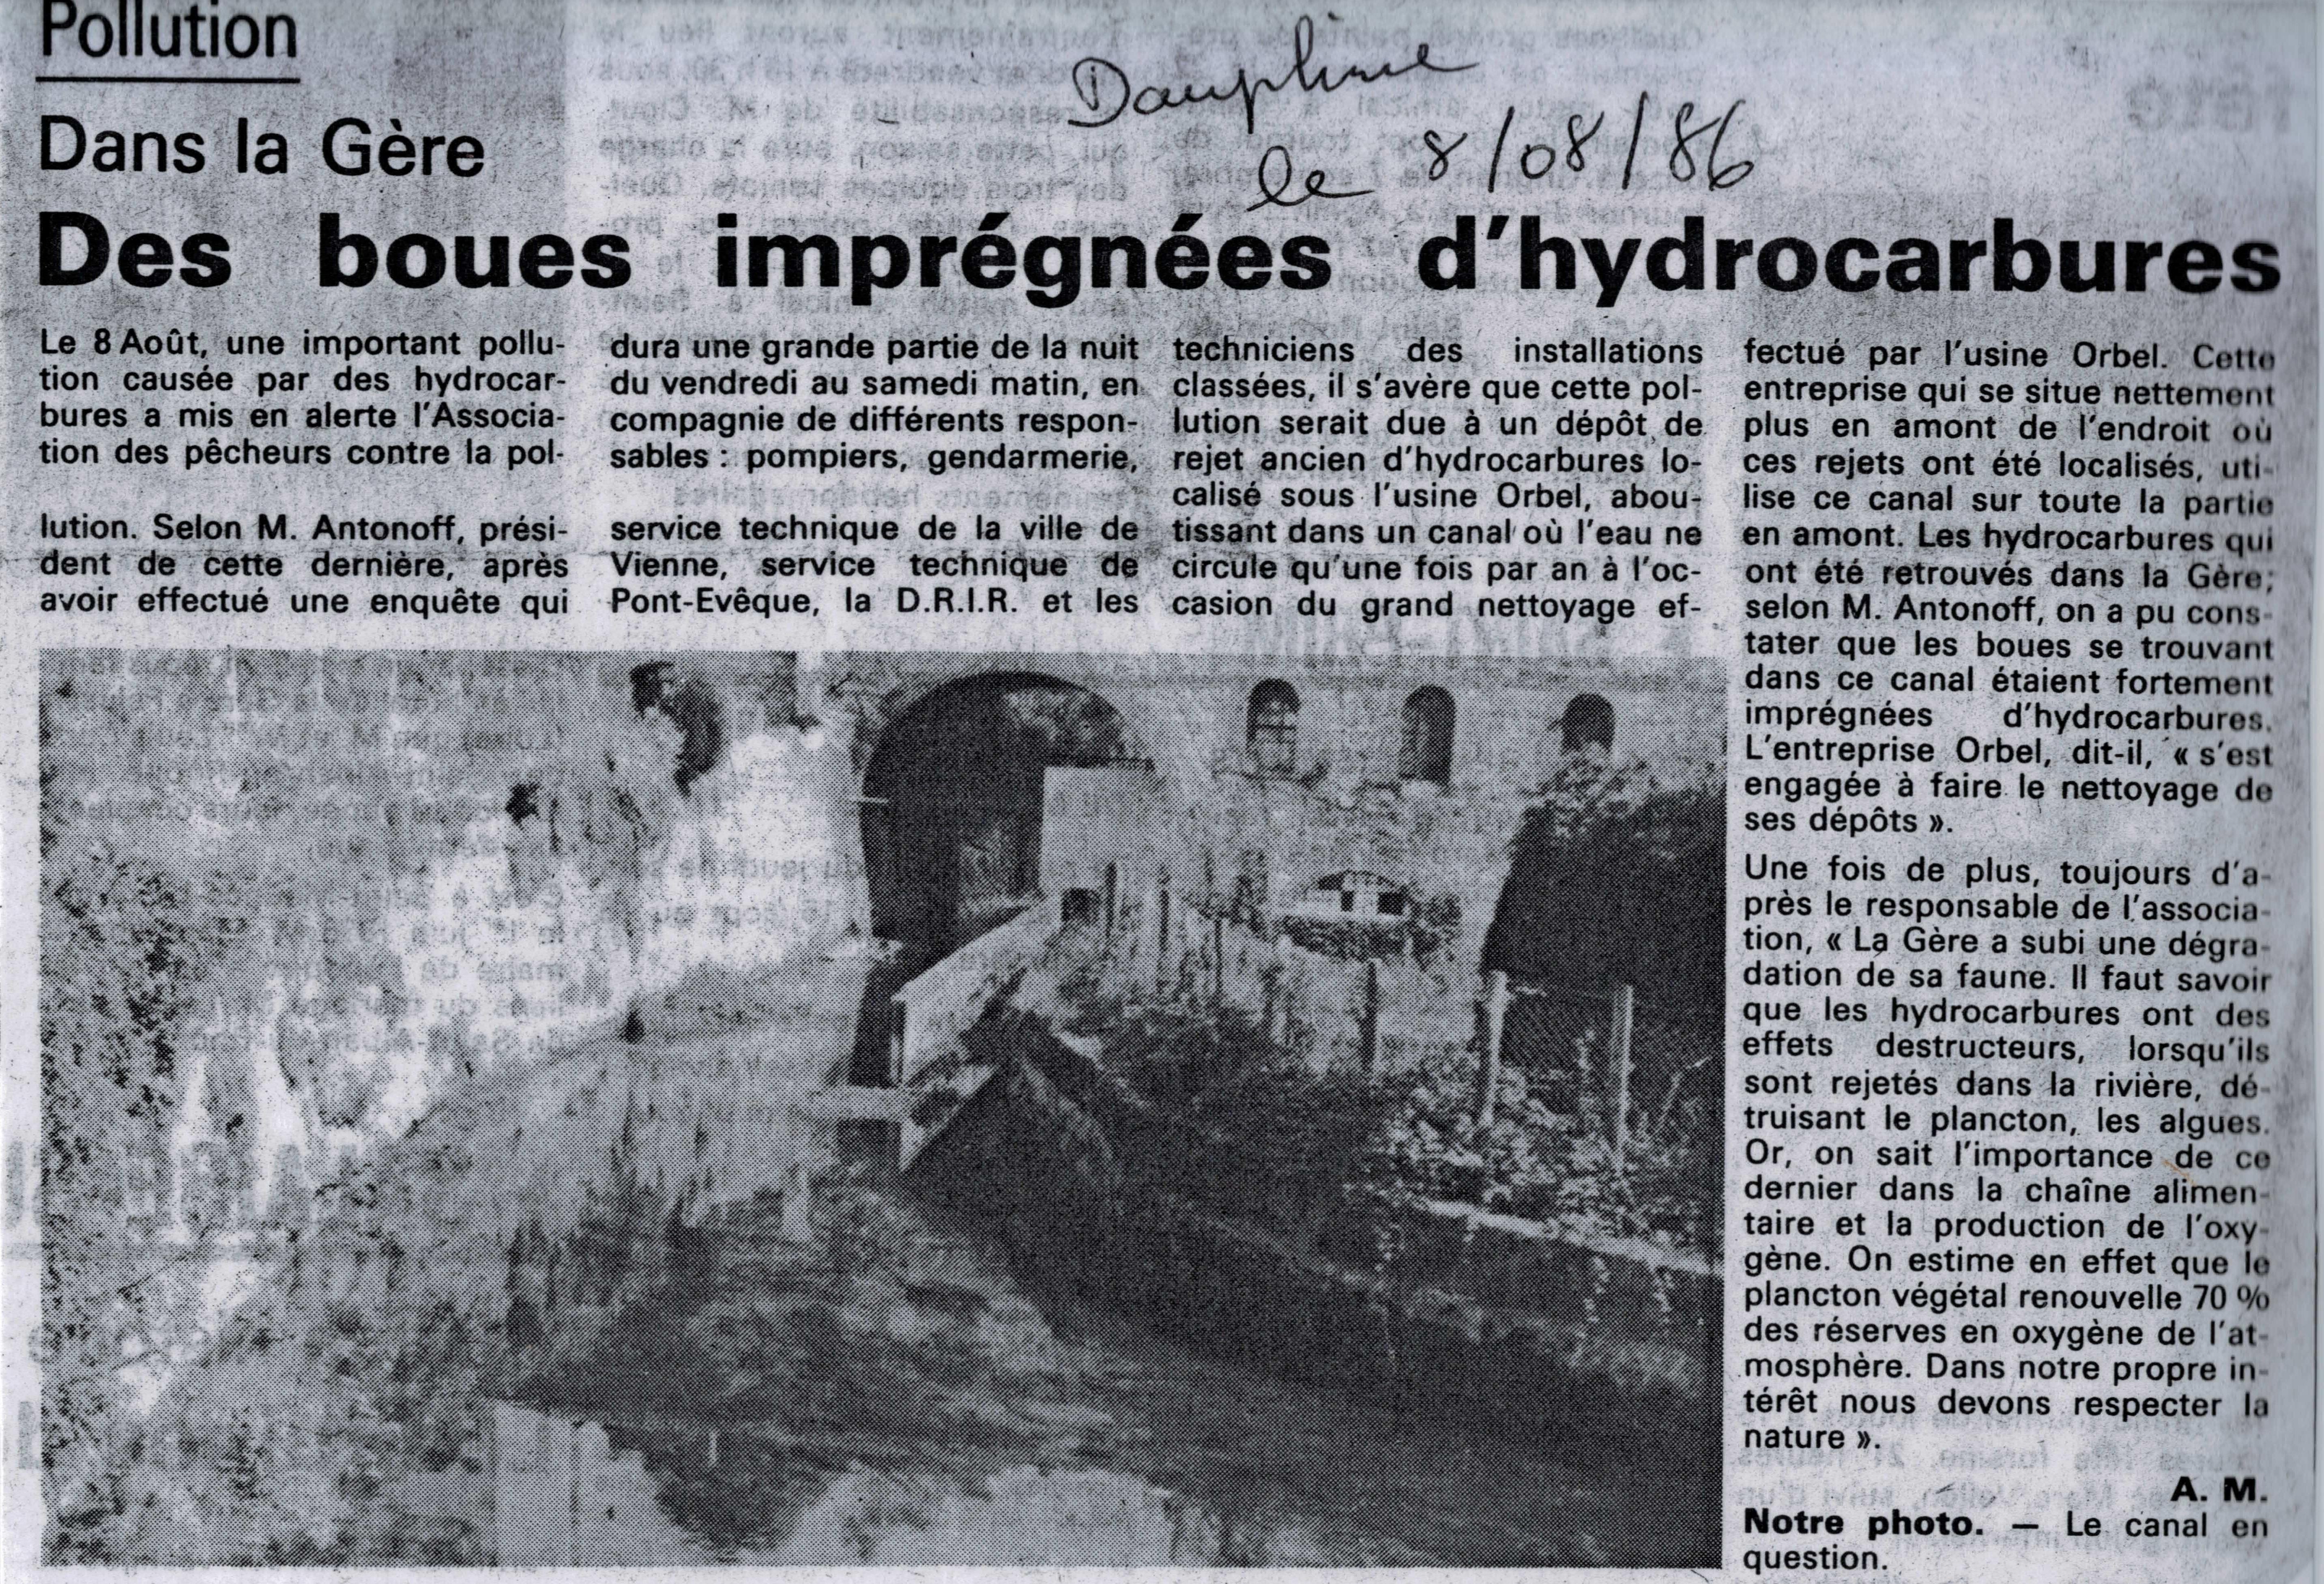 Dauphiné 08-08-1986